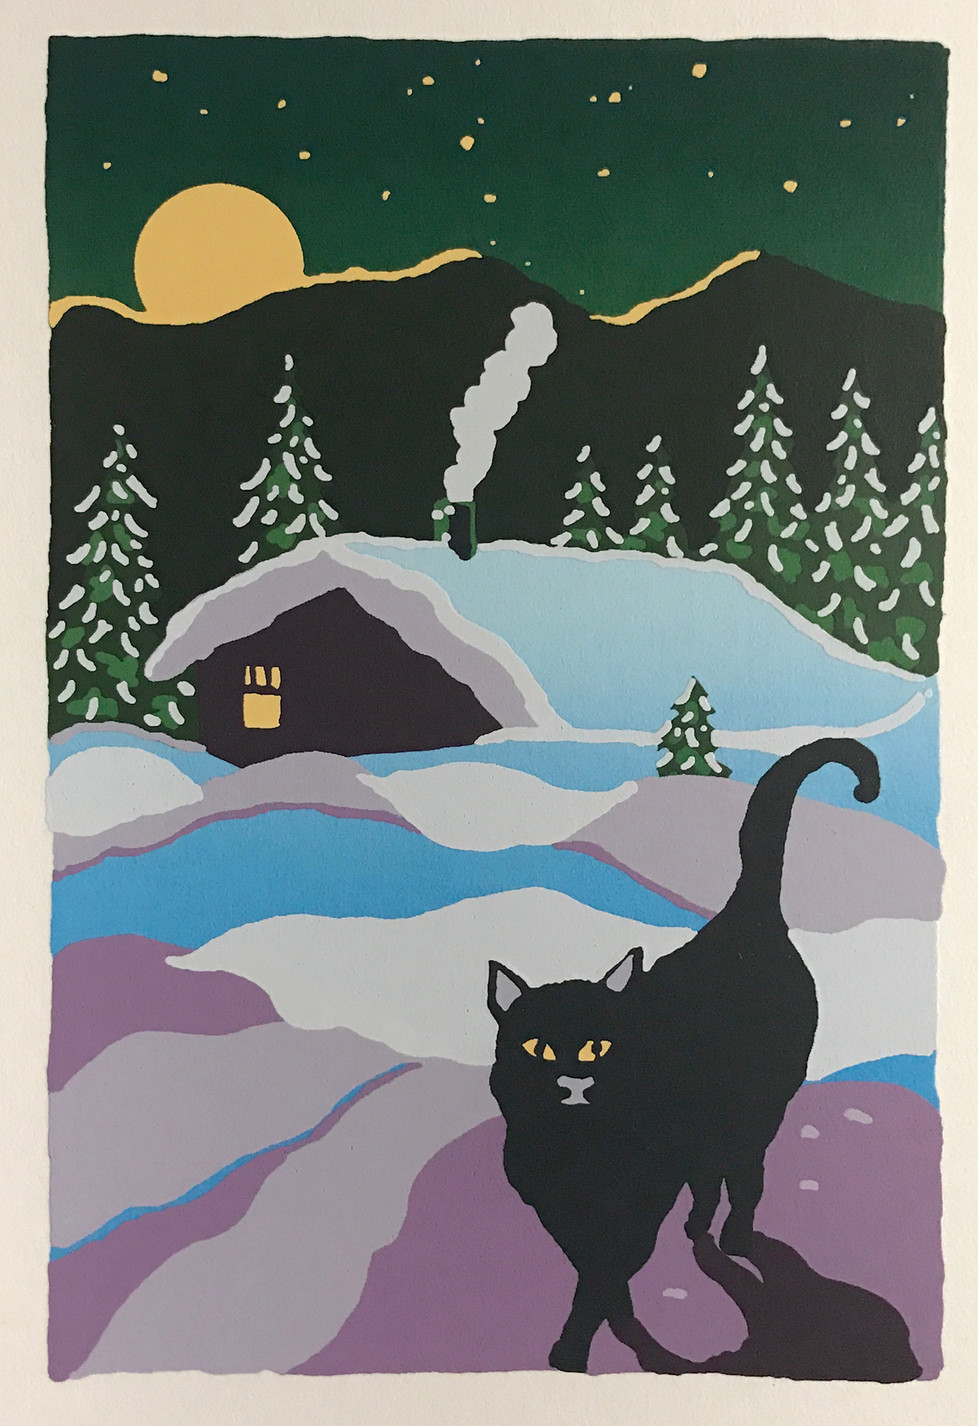 Allan Kollar 2017 Christmas Card